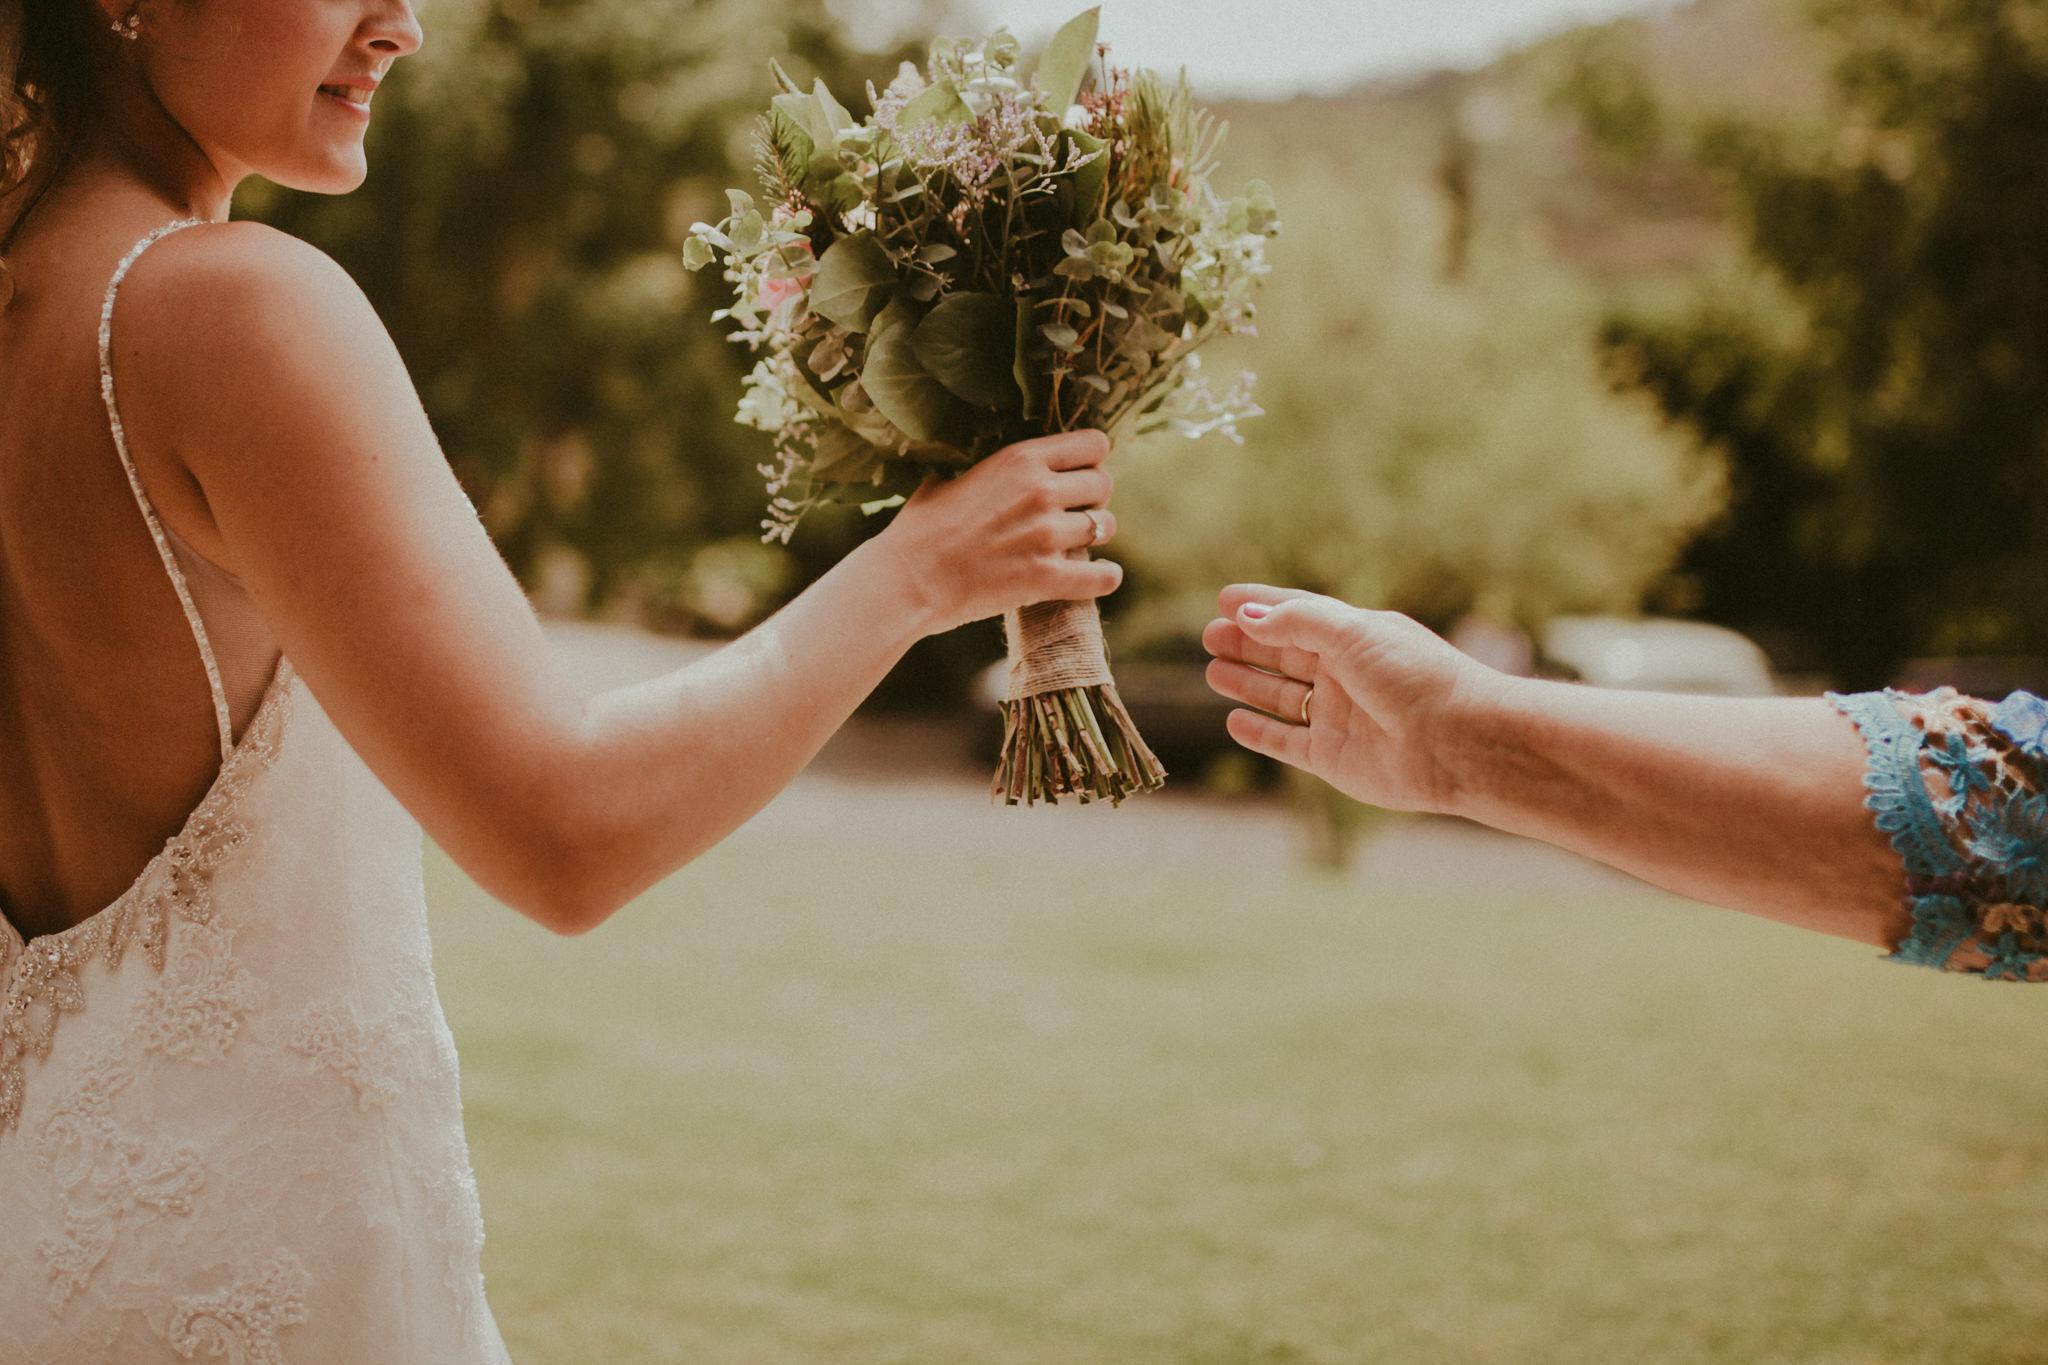 boda-diferente-fotografo-boda-laspalmas-grancanaria-24